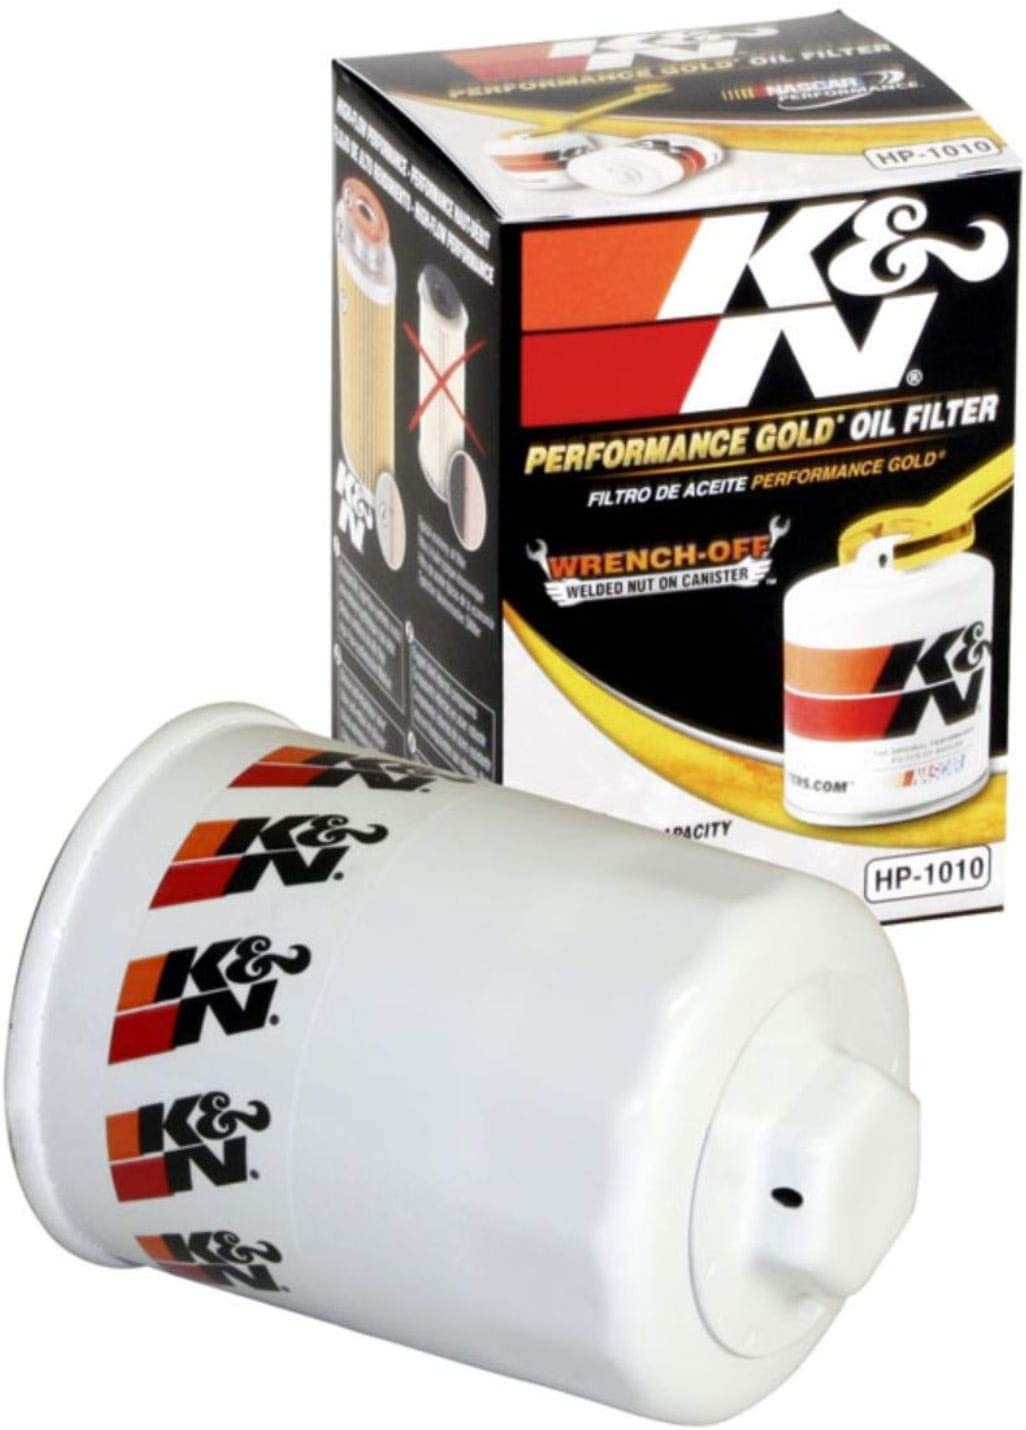 SUBARU LEGACY IMPREZA CIVIC K/&N PS-1010 Oil Filter fits HONDA ACCORD